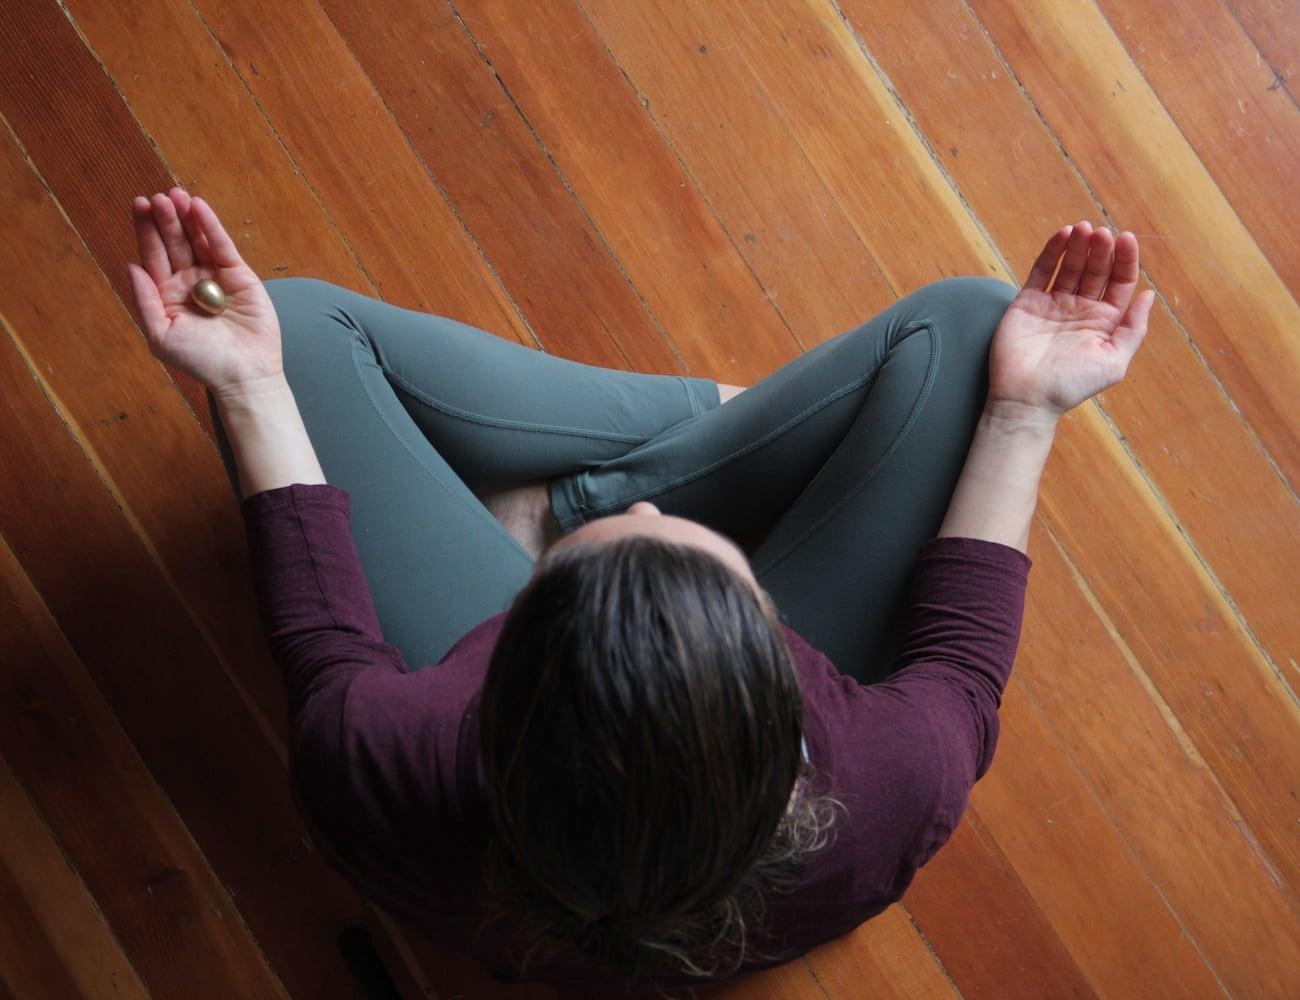 Thinking Nest Mindfulness Kit reminds you to stay balanced